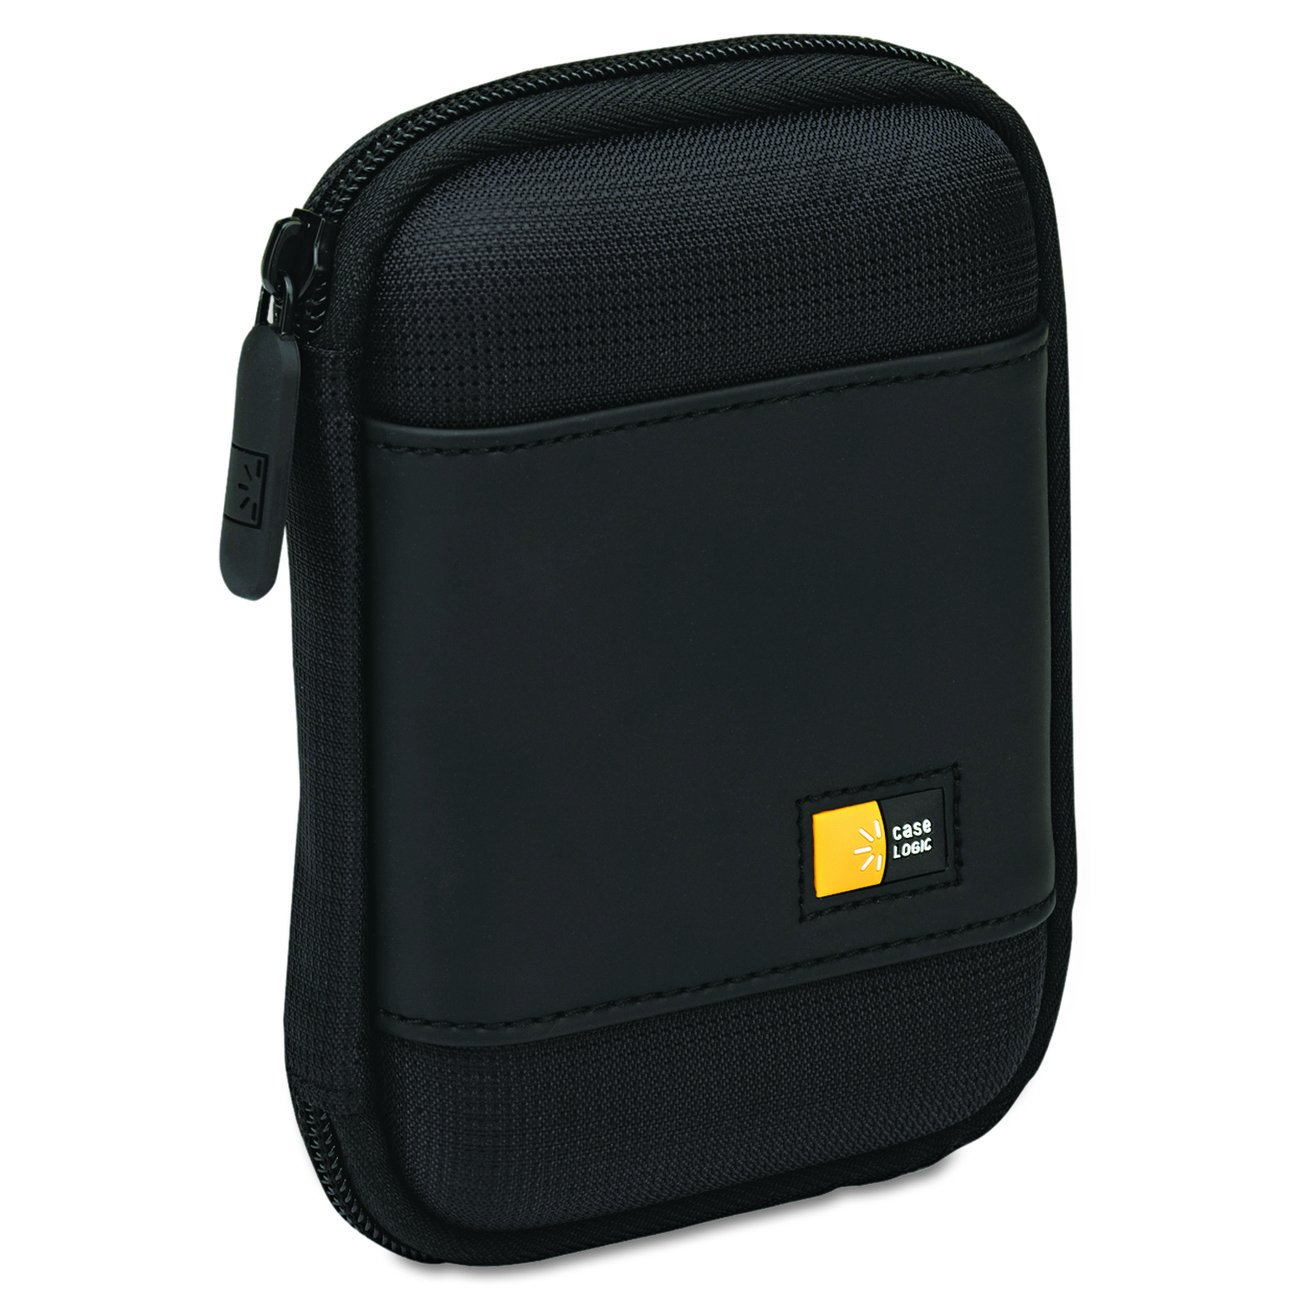 Case Logic PHDC-1 Compact Portable Hard Drive Case (Black) by Case Logic